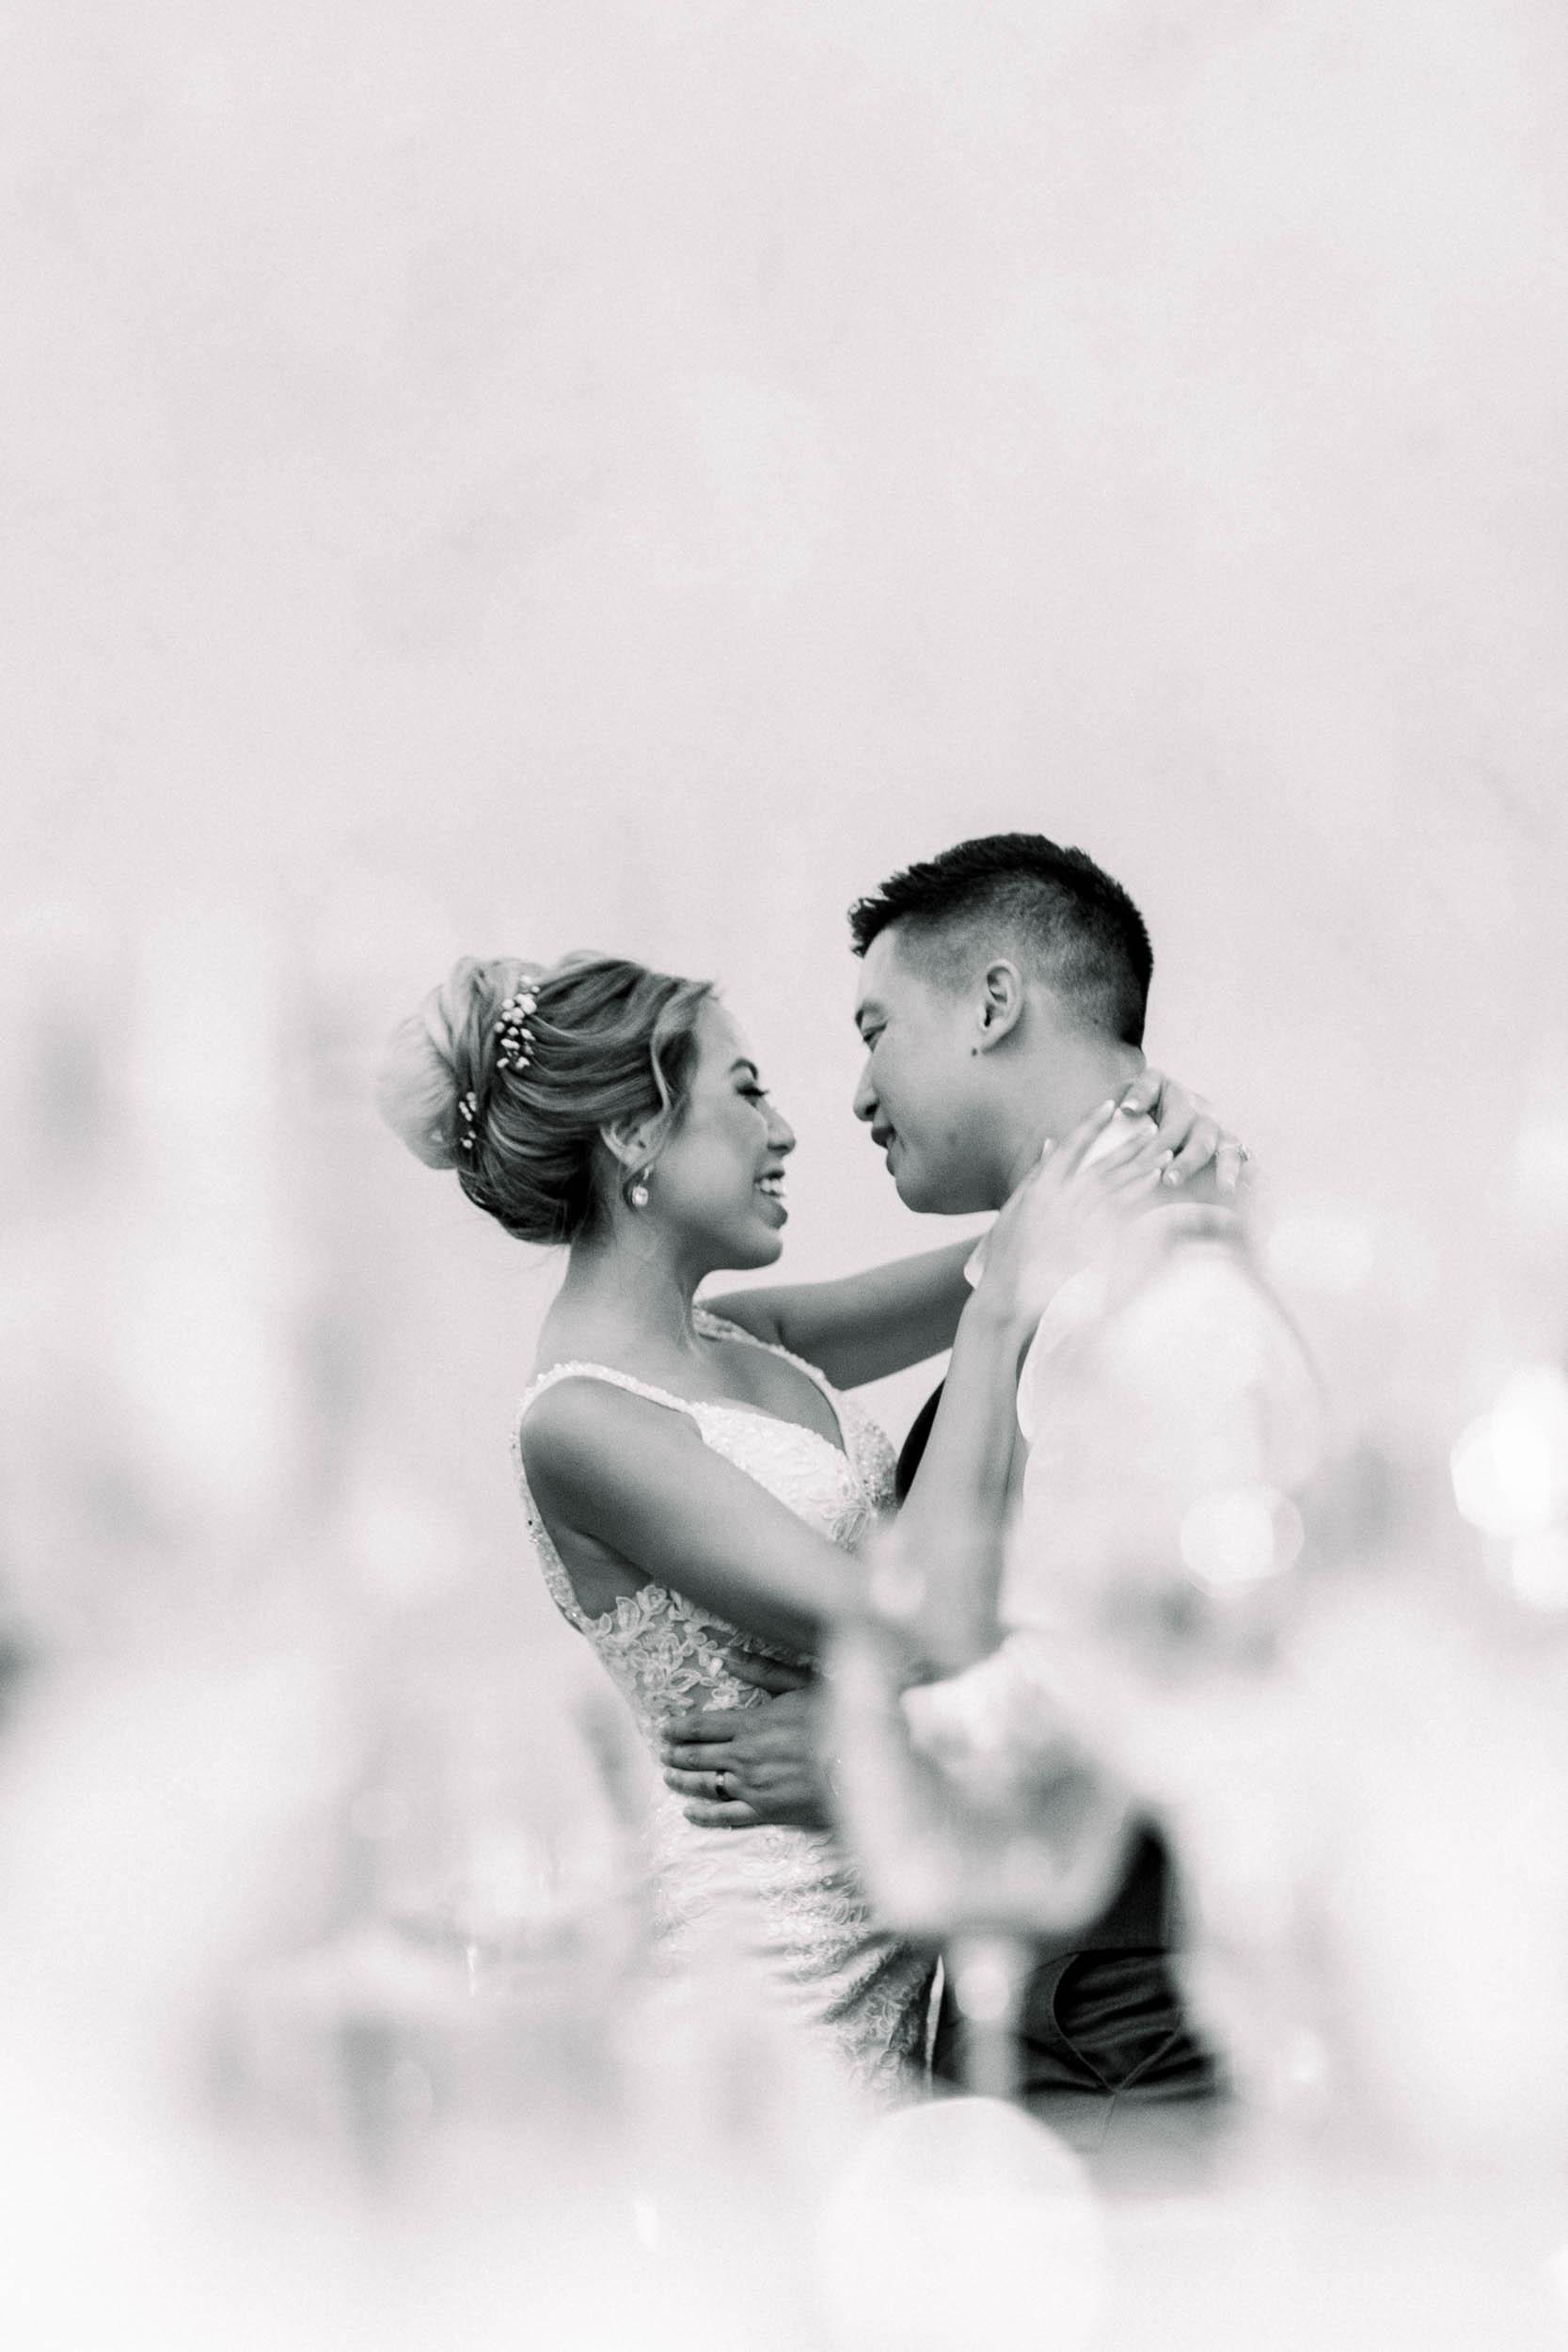 Las Positas Wedding_Buena Lane Photography_090118ER837-2.jpg